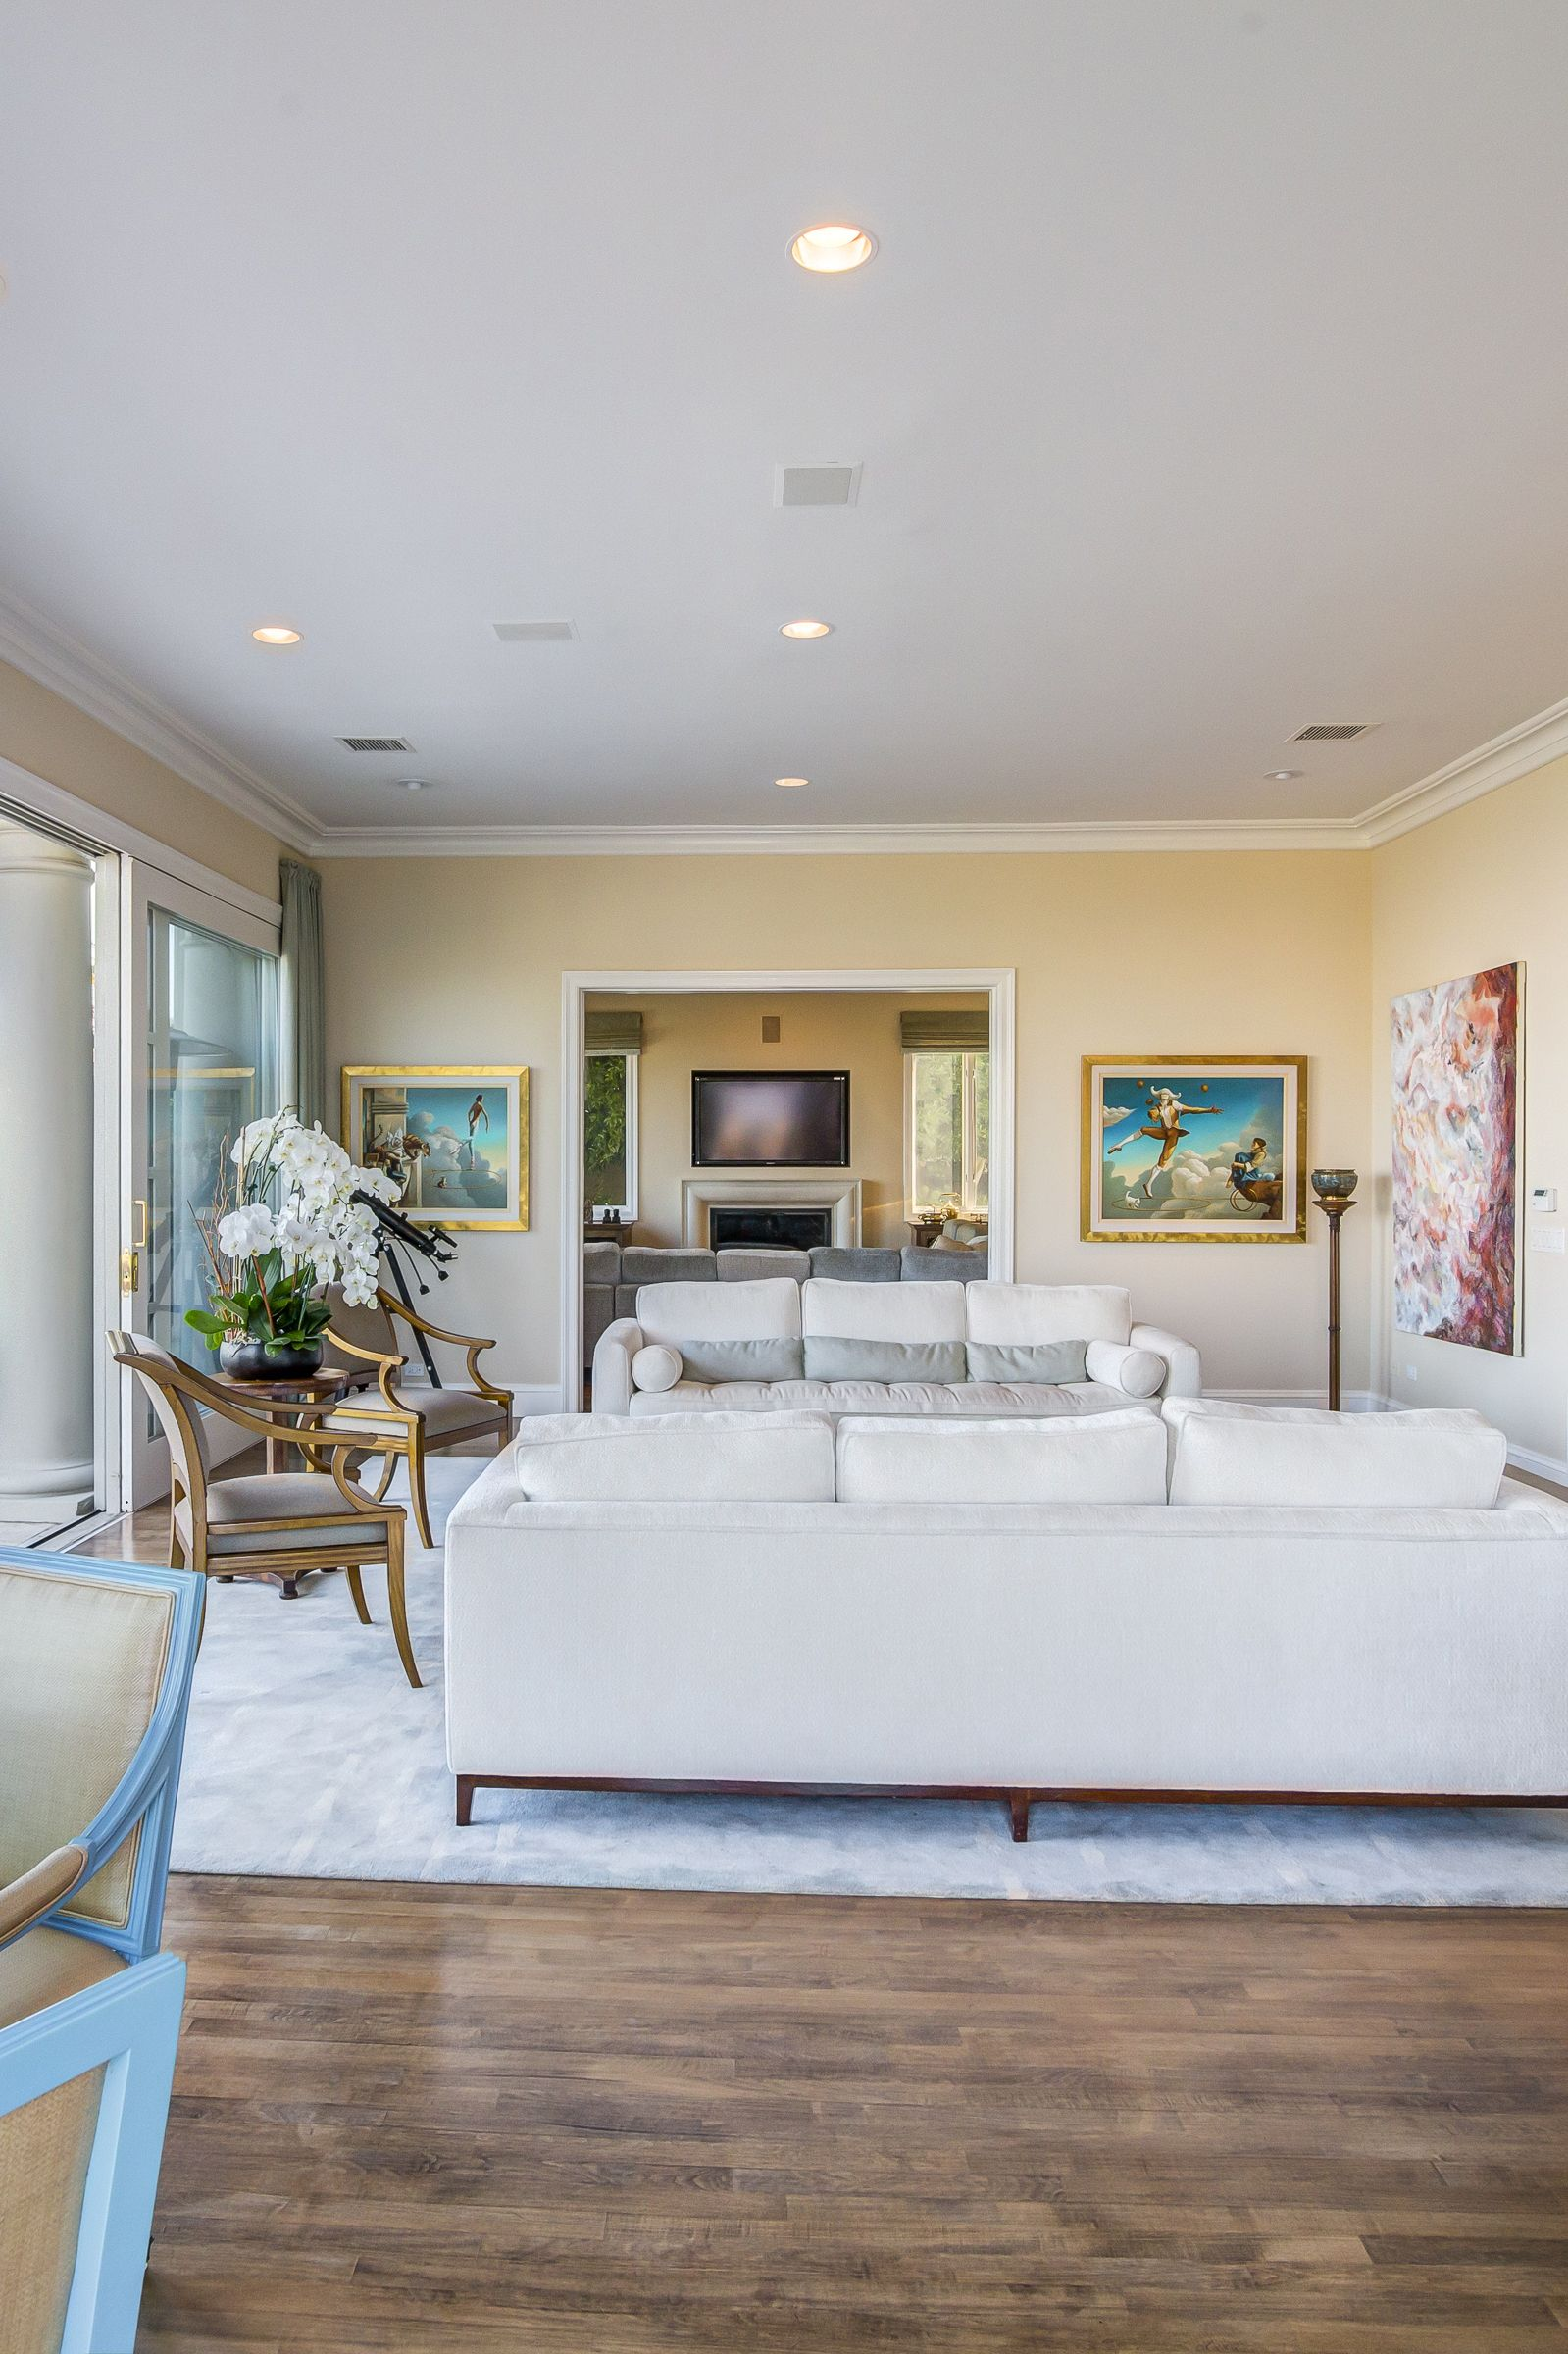 Mediterranean bel air mansion with antique furniture and modern art luxury california home interior decor design katy lee estate sales